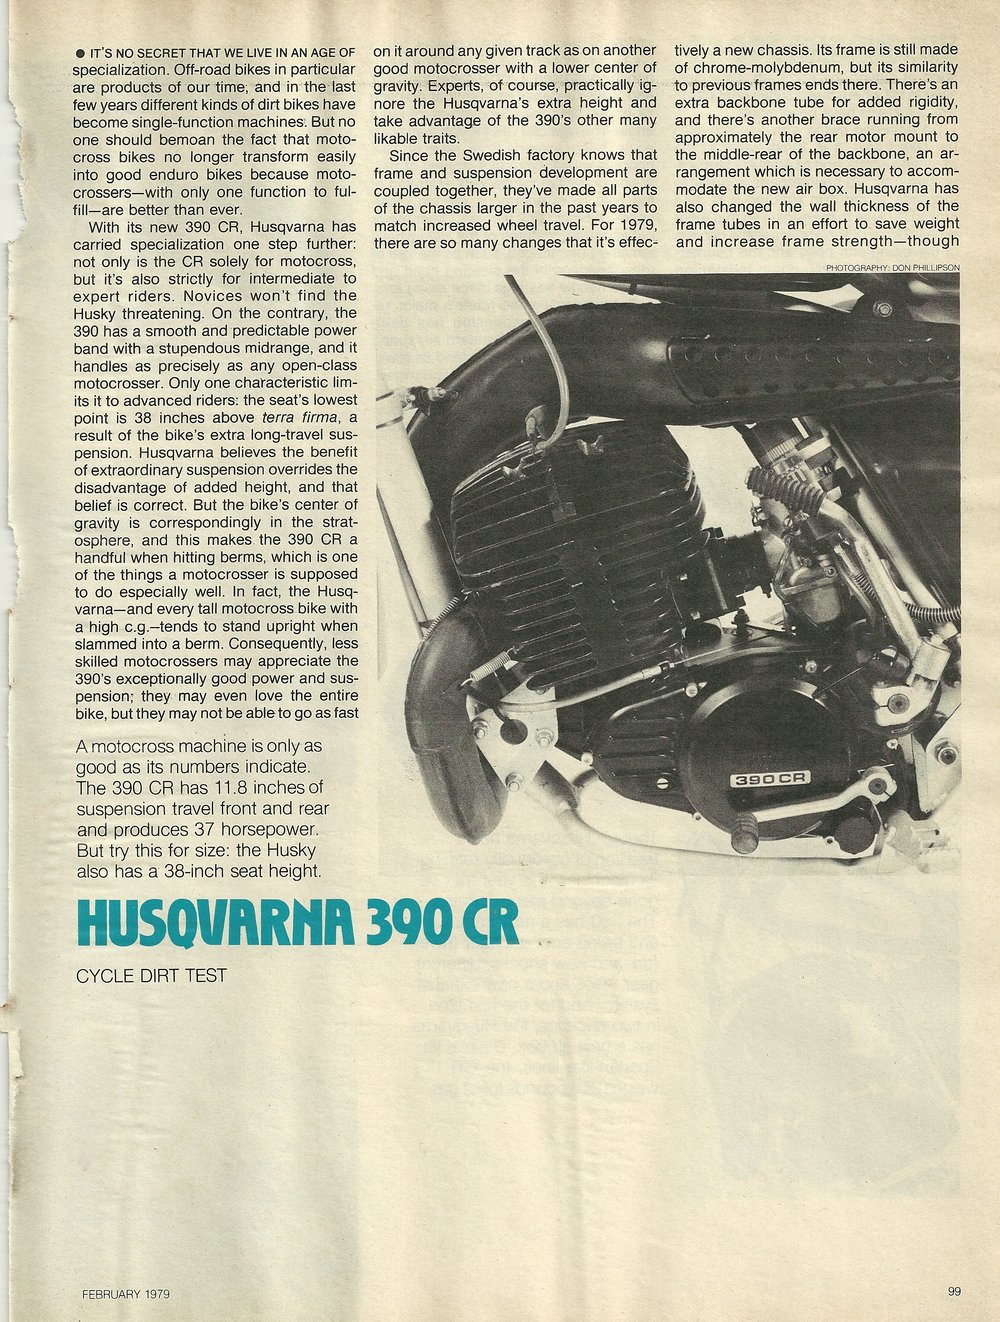 1979 Husqvarna 390 CR off road test 2.JPG